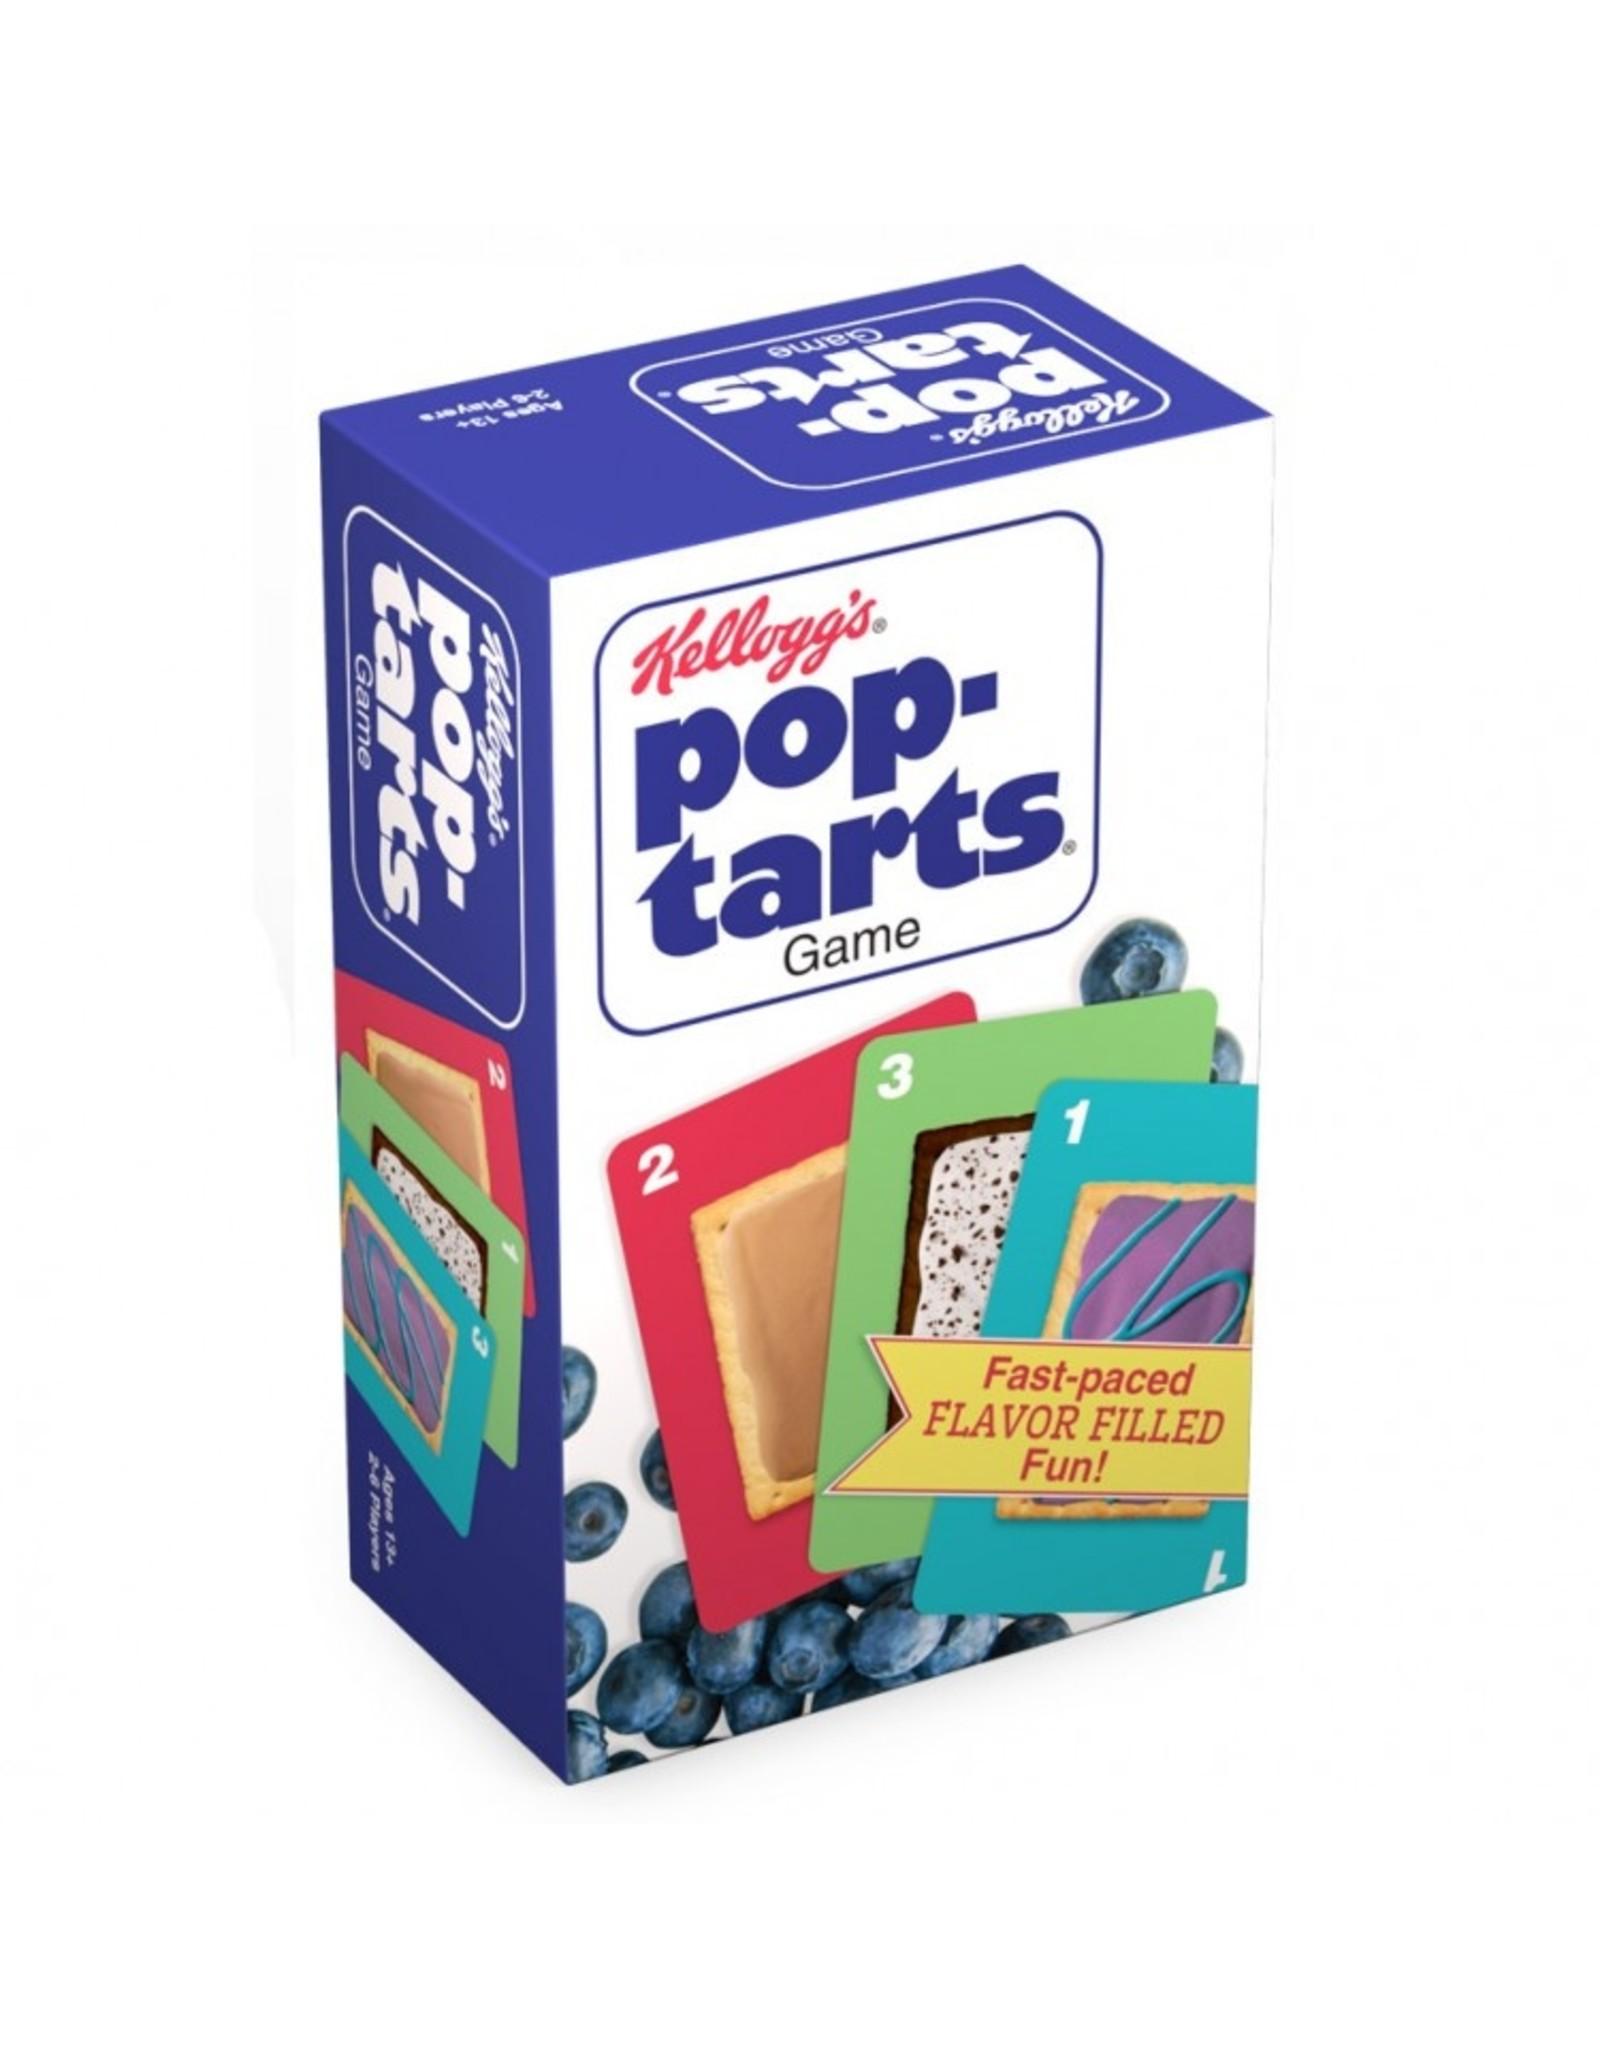 Funko Pop-Tarts Card Game